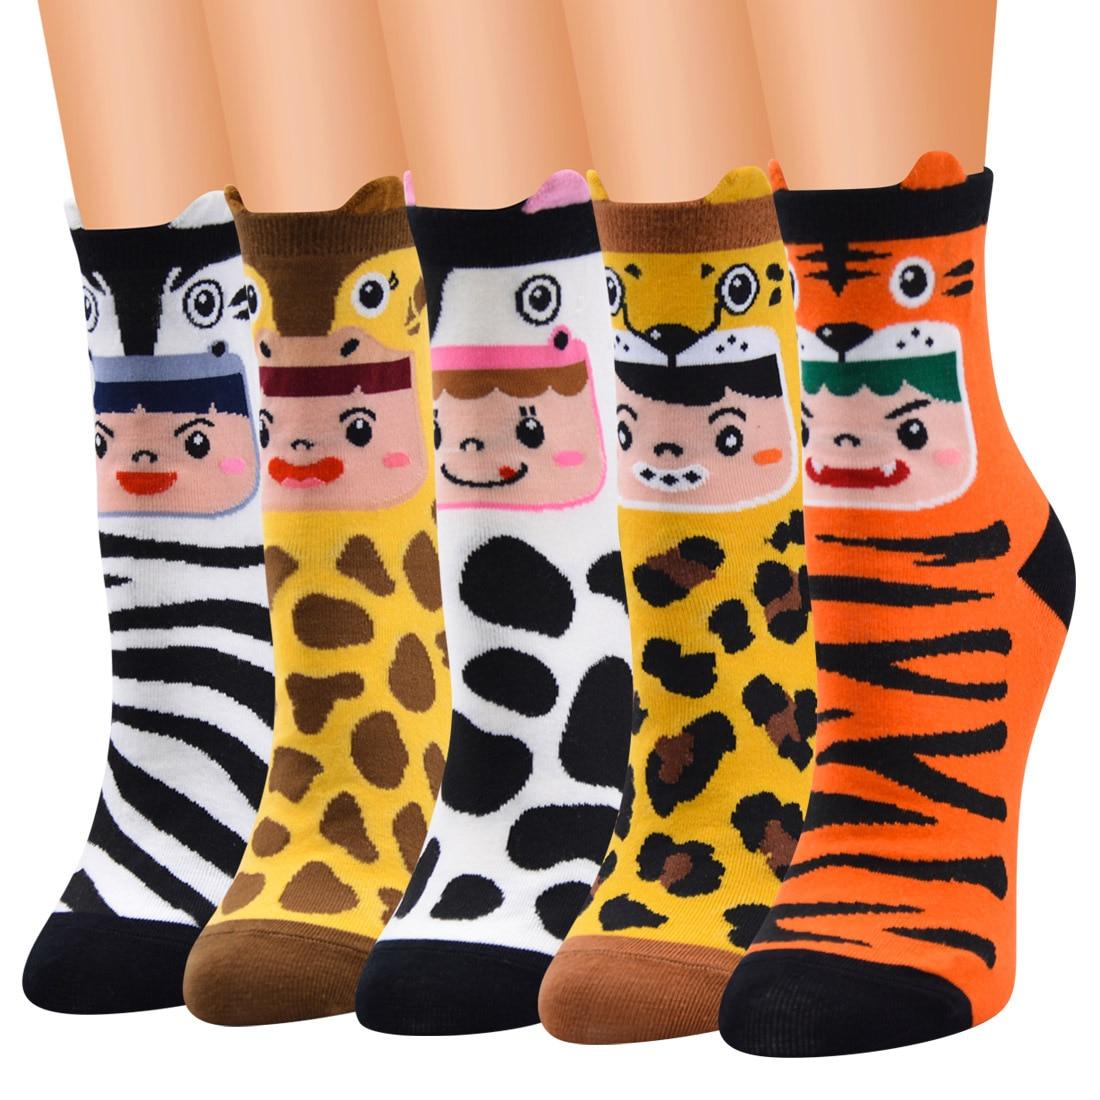 Latest Fashion Trend Women Low Tube Animal Pattern Zebra Leopard Cotton Socks Girls